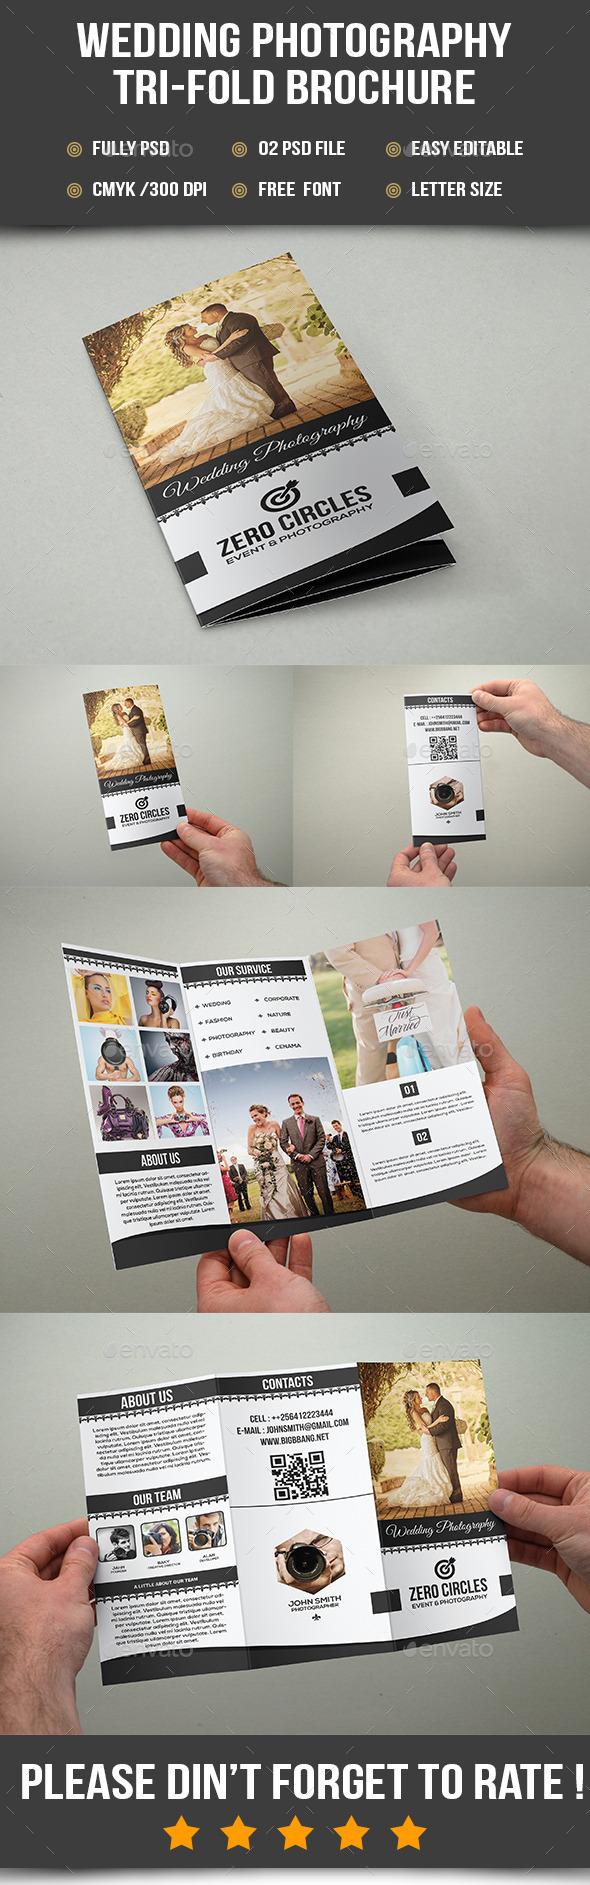 Wedding Photography Tri-Fold Brochure - Brochures Print Templates